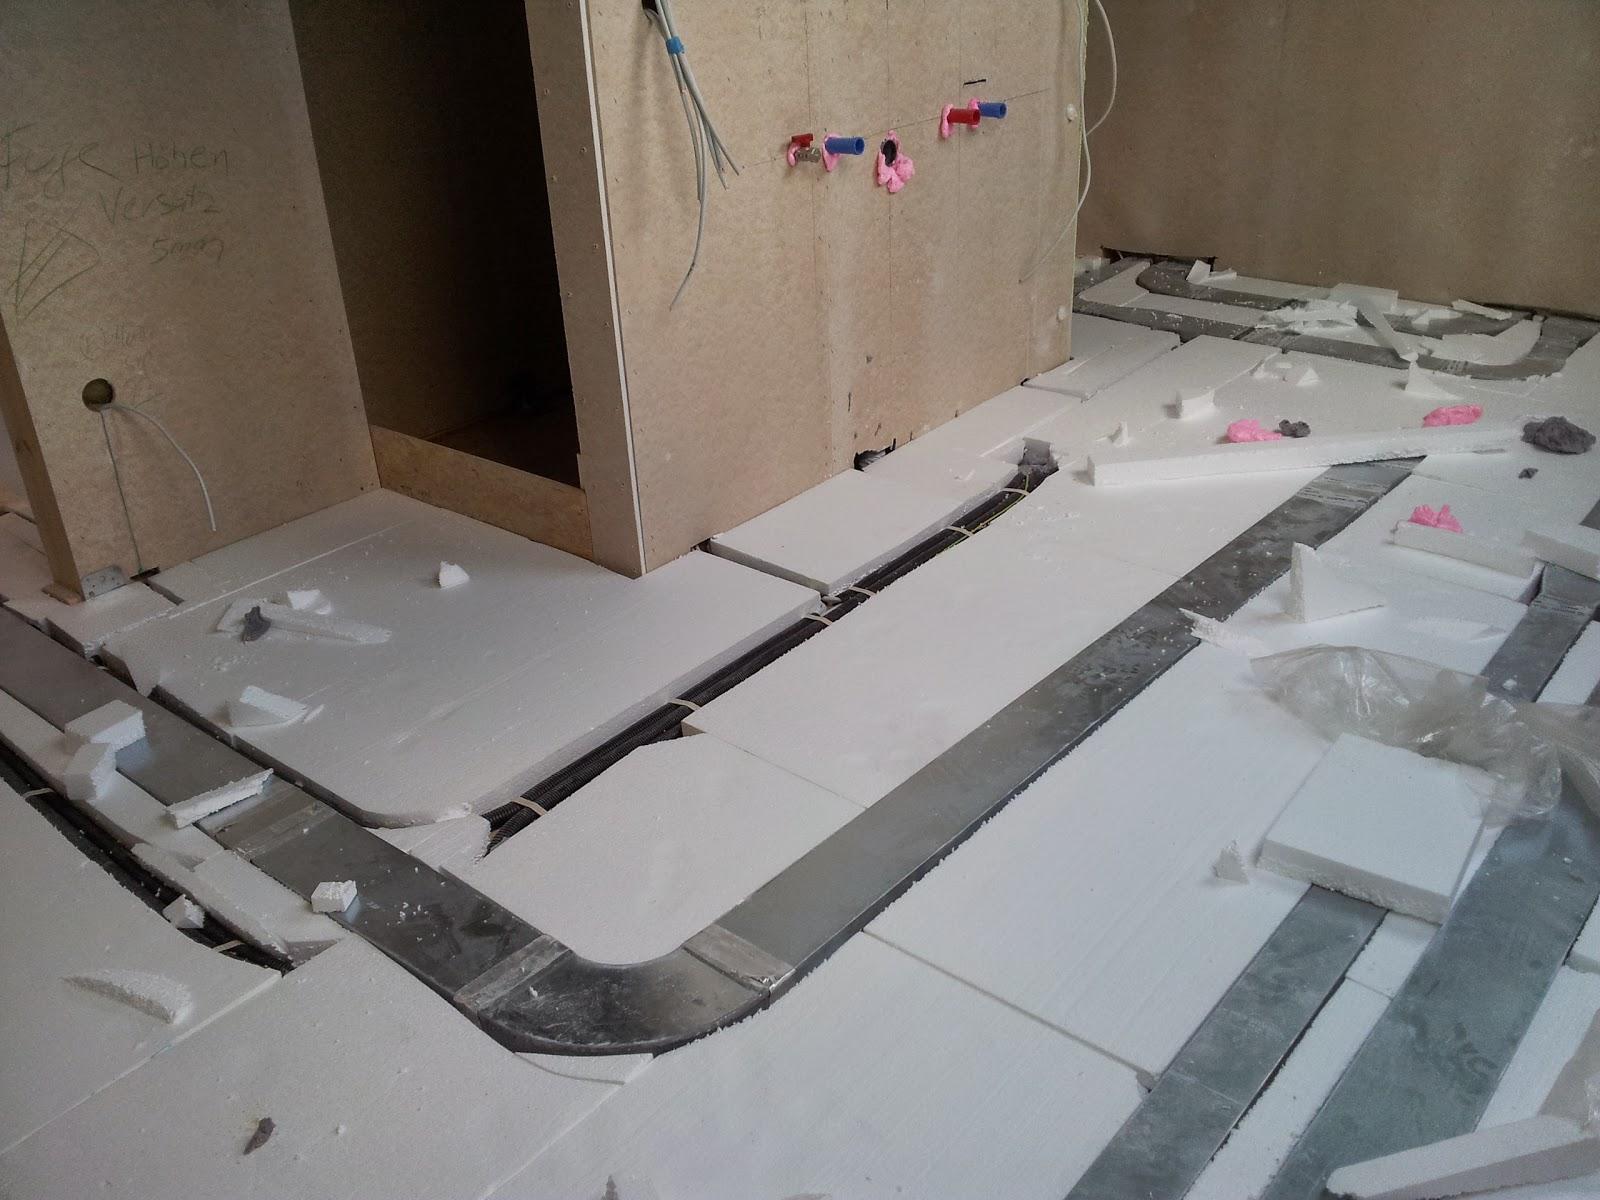 Fußboden Wärmedämmung Verlegen ~ Dämmung fußboden estrich estrichaufbau verschiedene